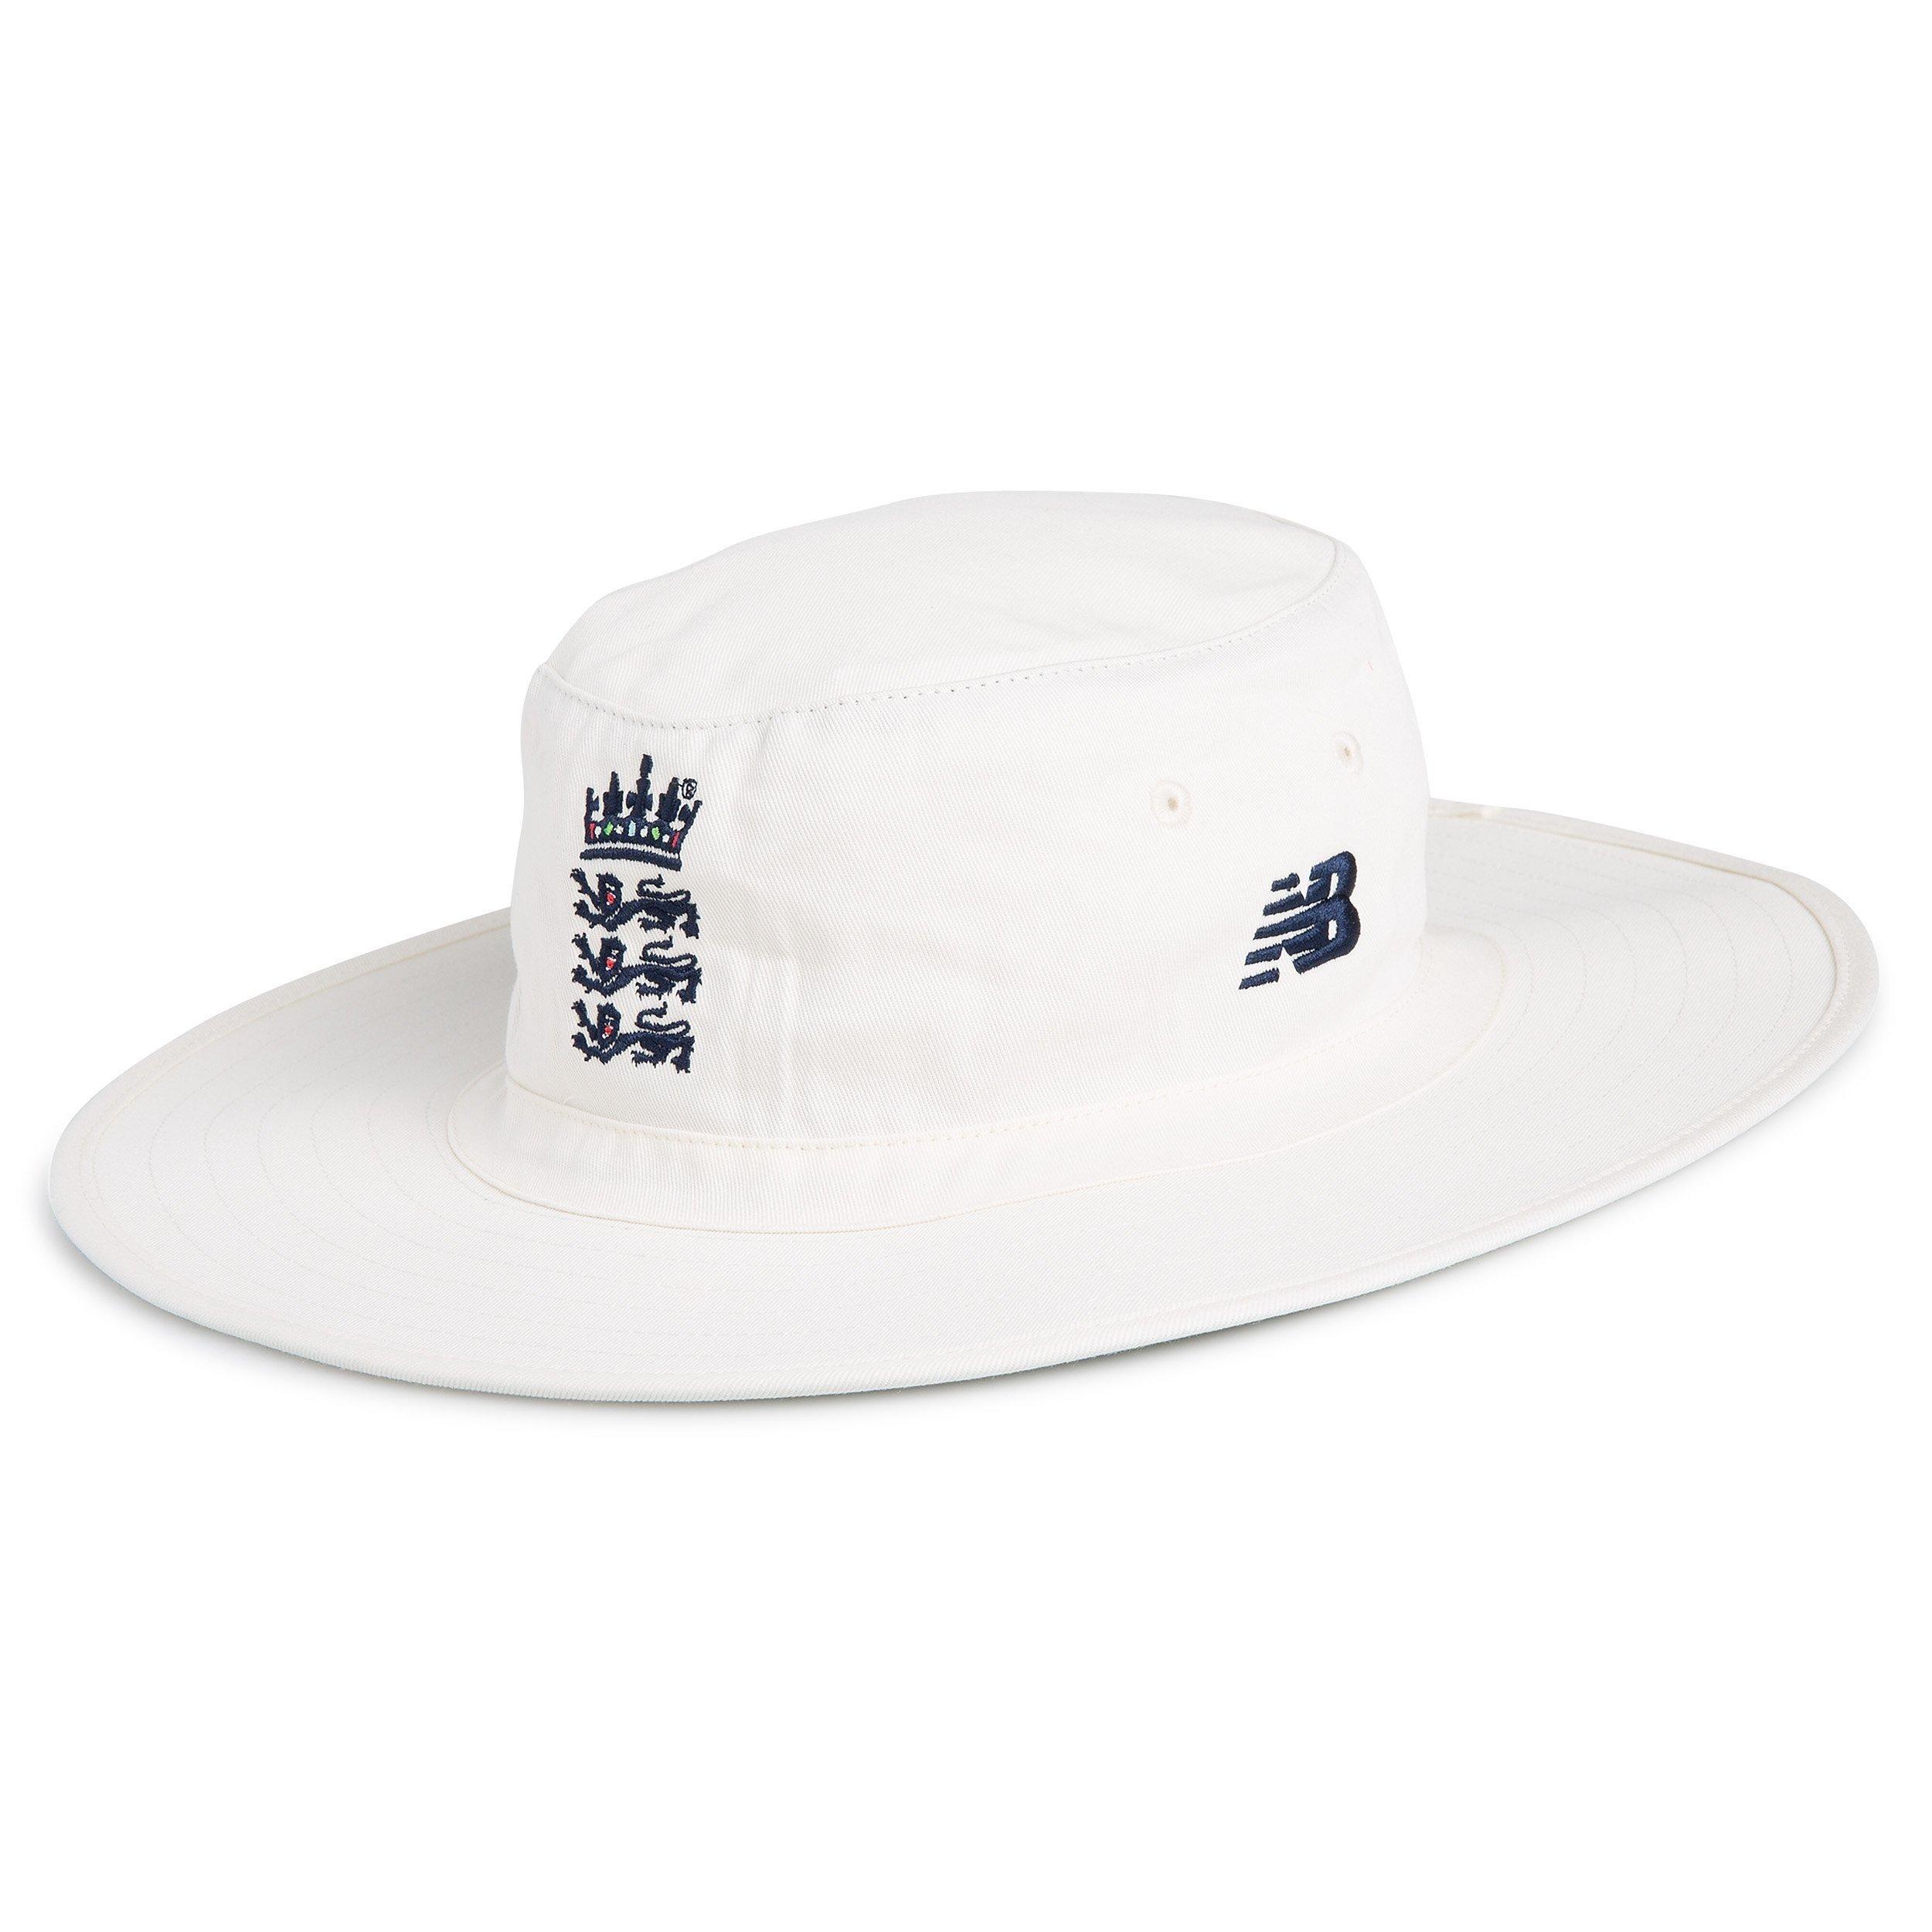 2017 New Balance England Test Cricket Sunhat